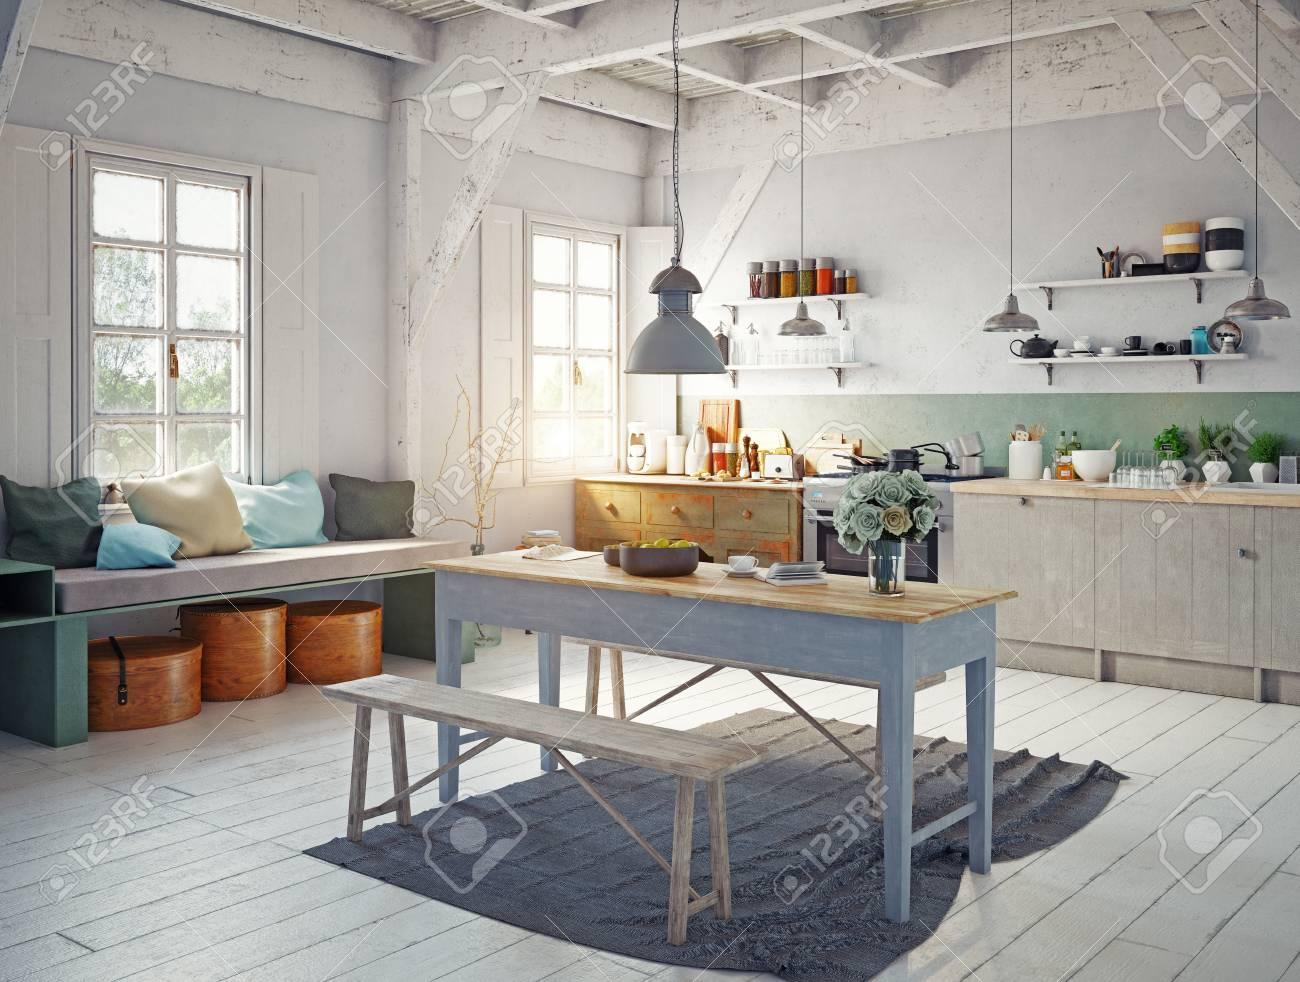 vintage style kitchen interior. 3d rendering concept design - 96013726